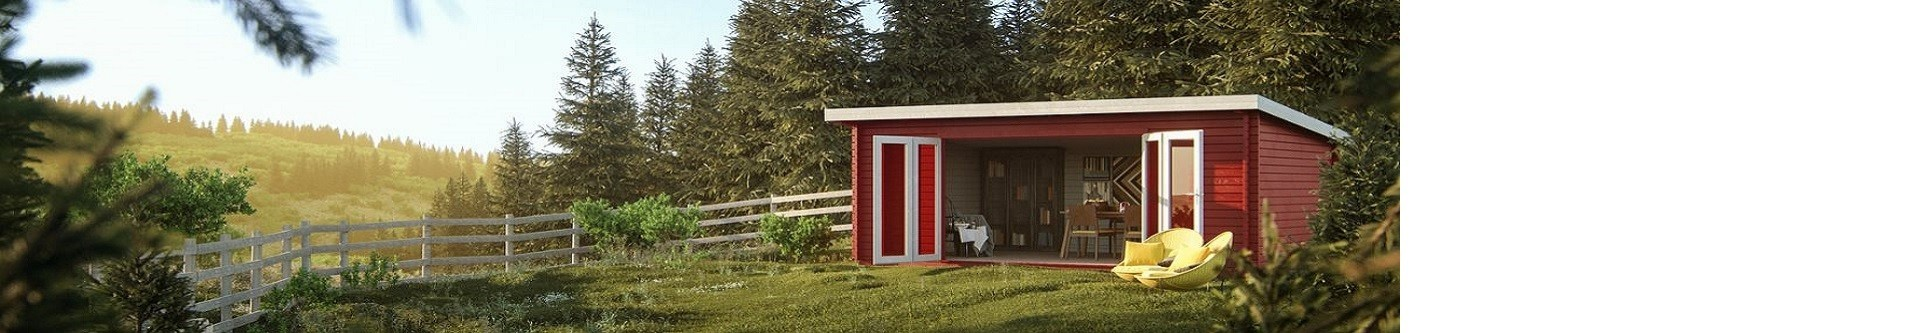 Casetas de madera con techo plano